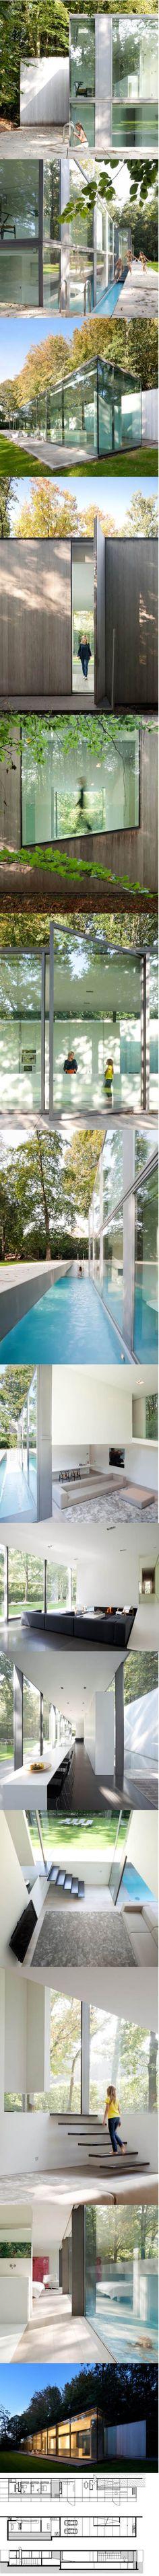 2012 Govaert & Vanhoutte - Villa Roces / Bruges / wood / Belgium / minimalism